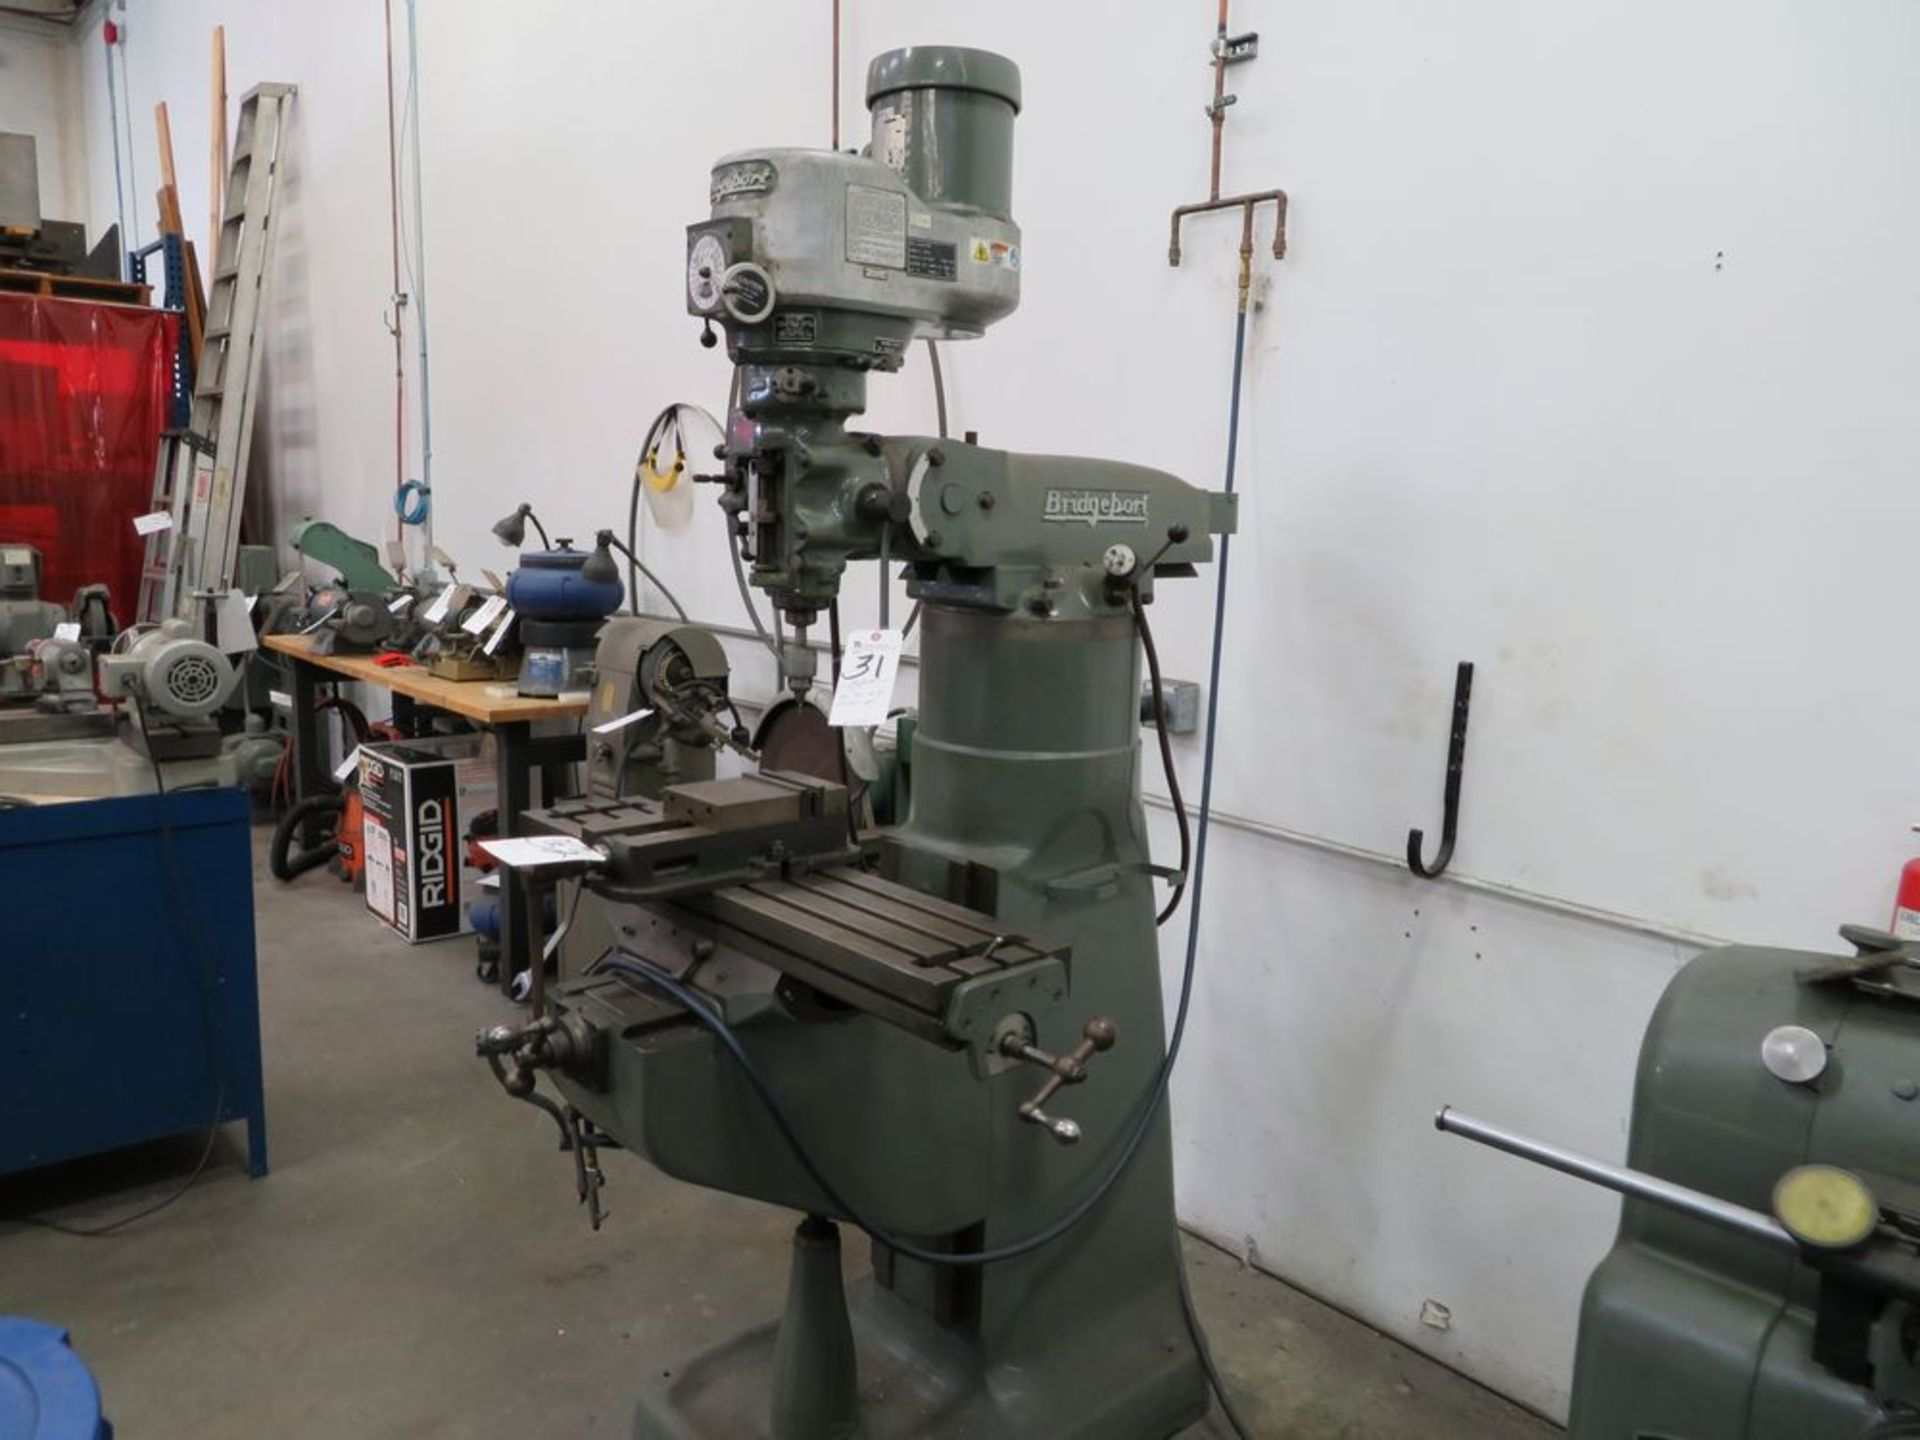 "Lot 31 - Bridgeport 1 ½ hp Vertical Mill, Var. Spd. w/ 9"" x 42"" Table; S/N 120496"